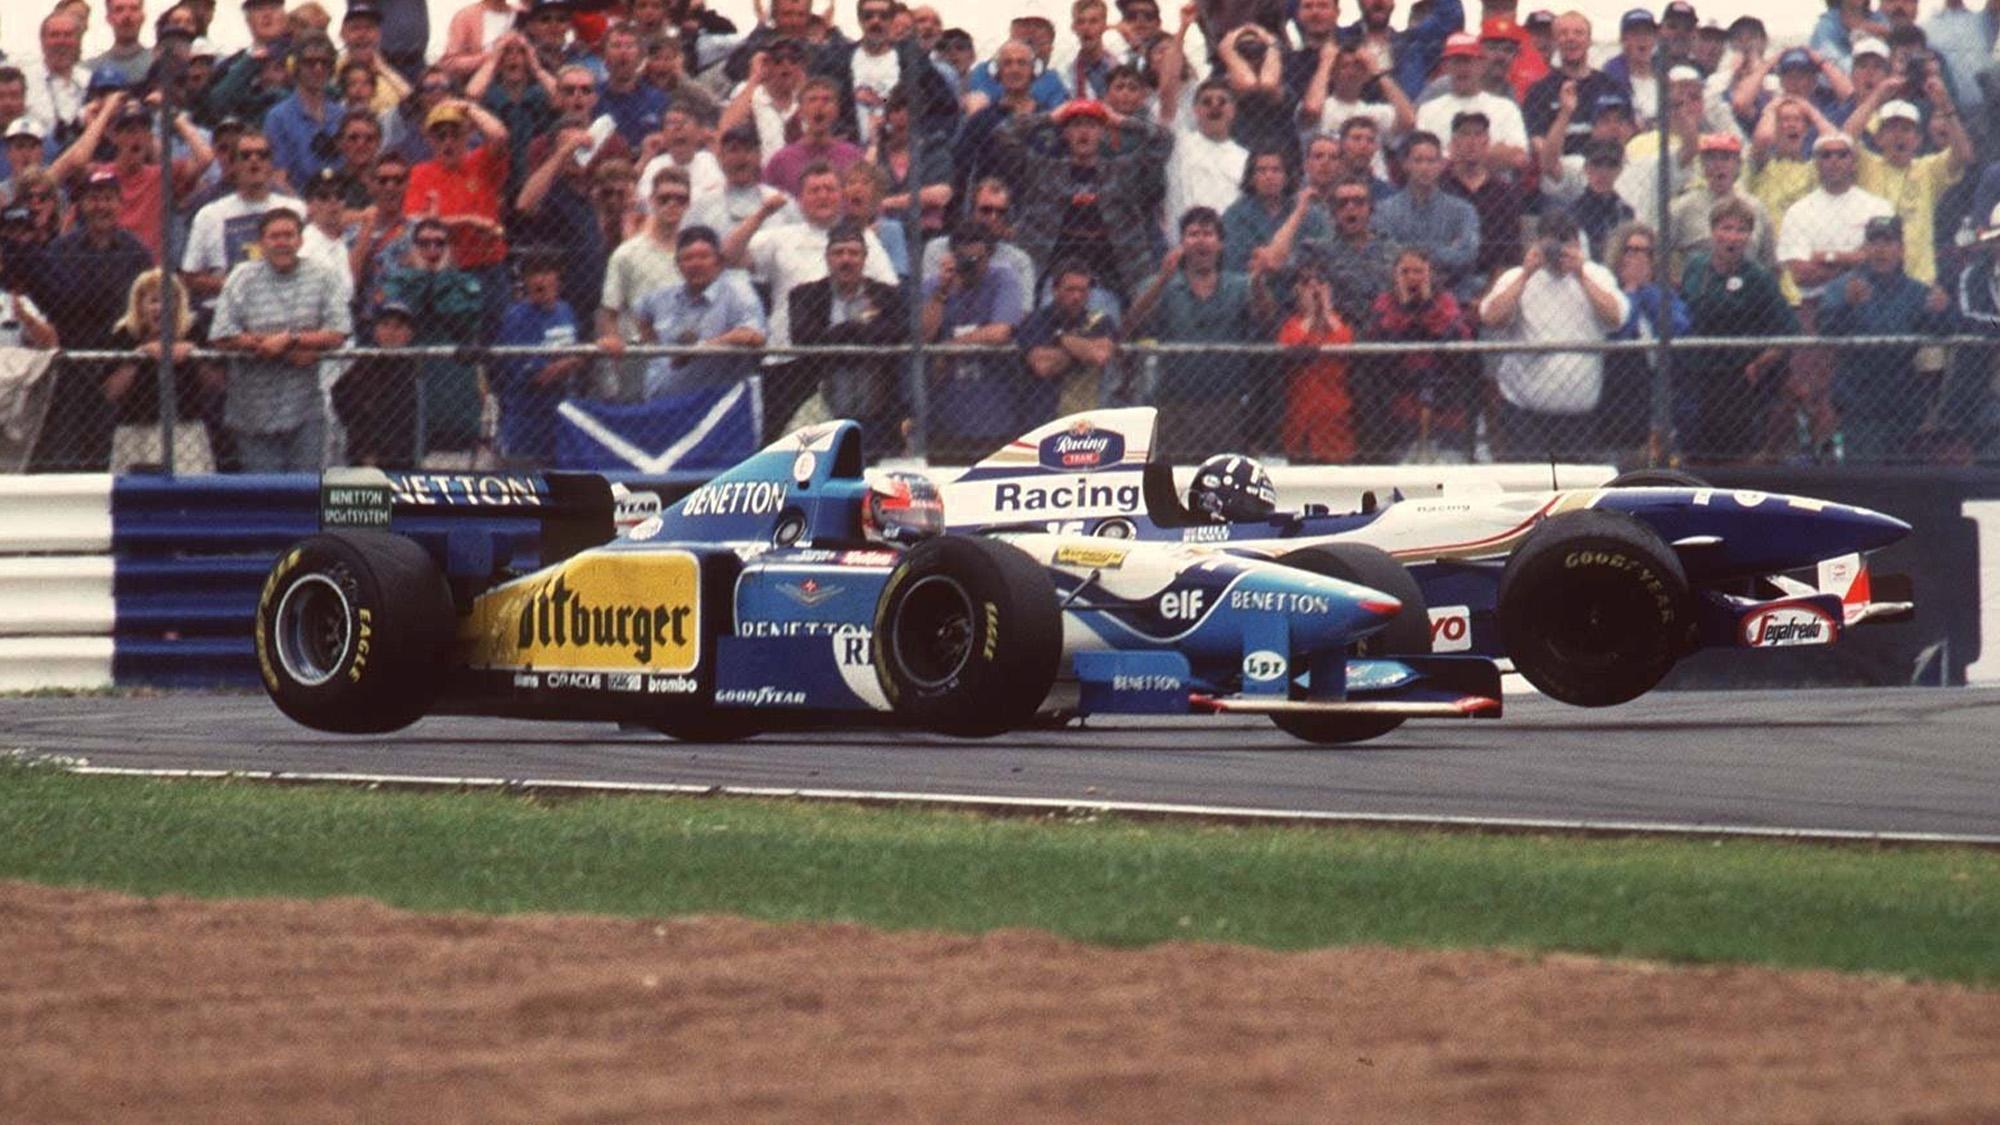 Damon Hill and Michael Schumacher crash at Silverstone in 1995